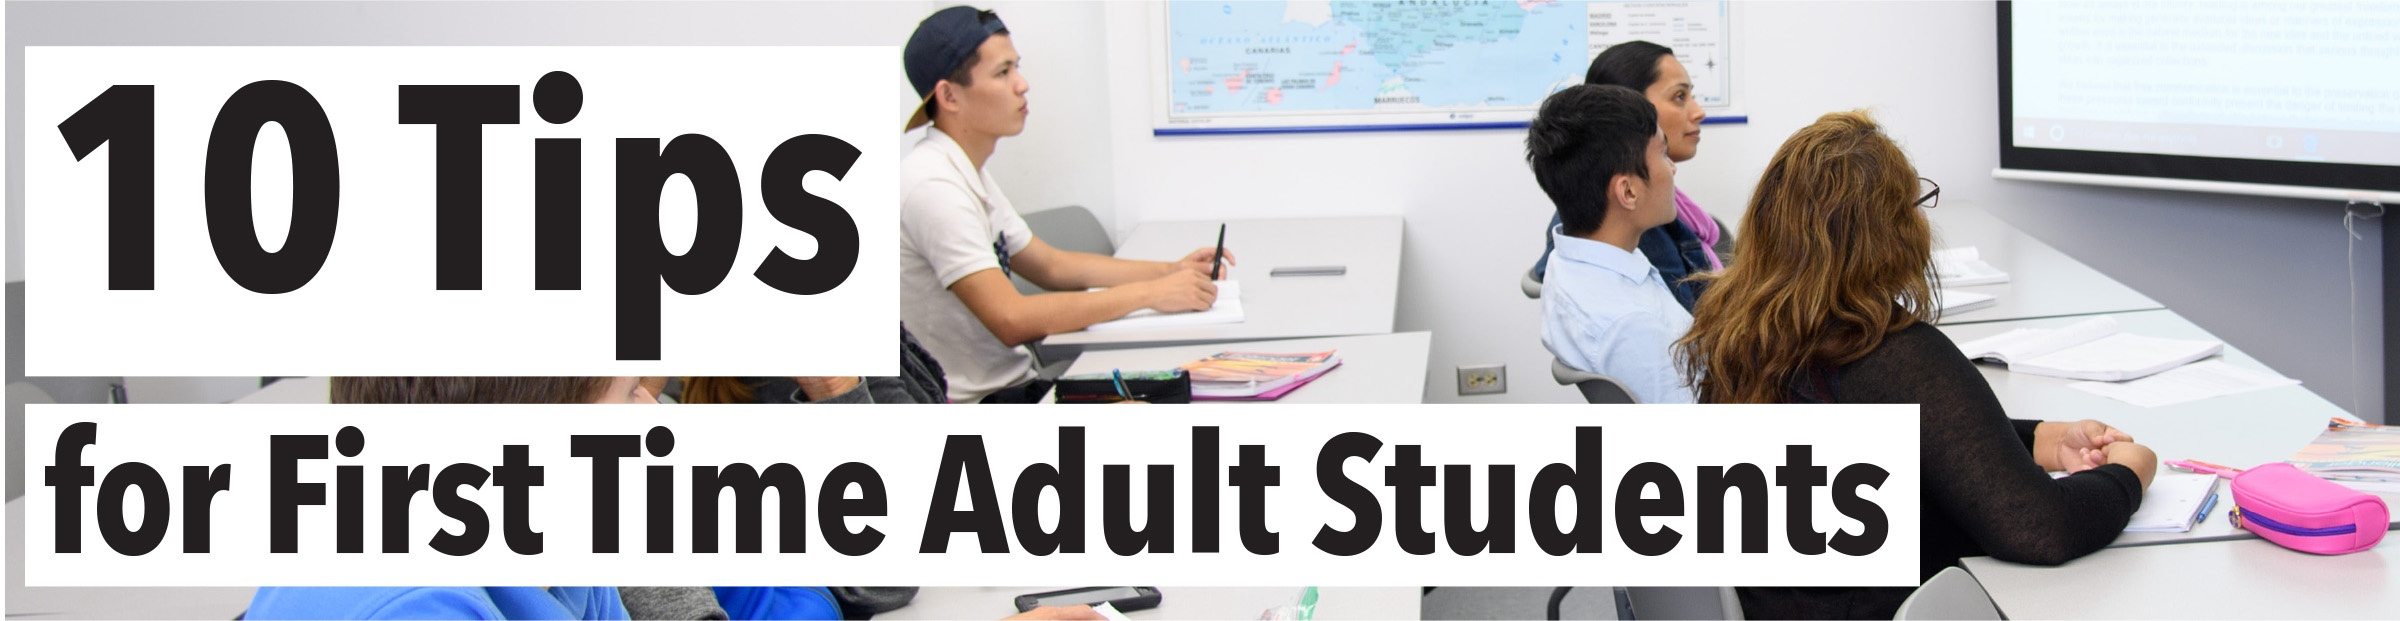 10 Tips Adult Students Banner.jpg